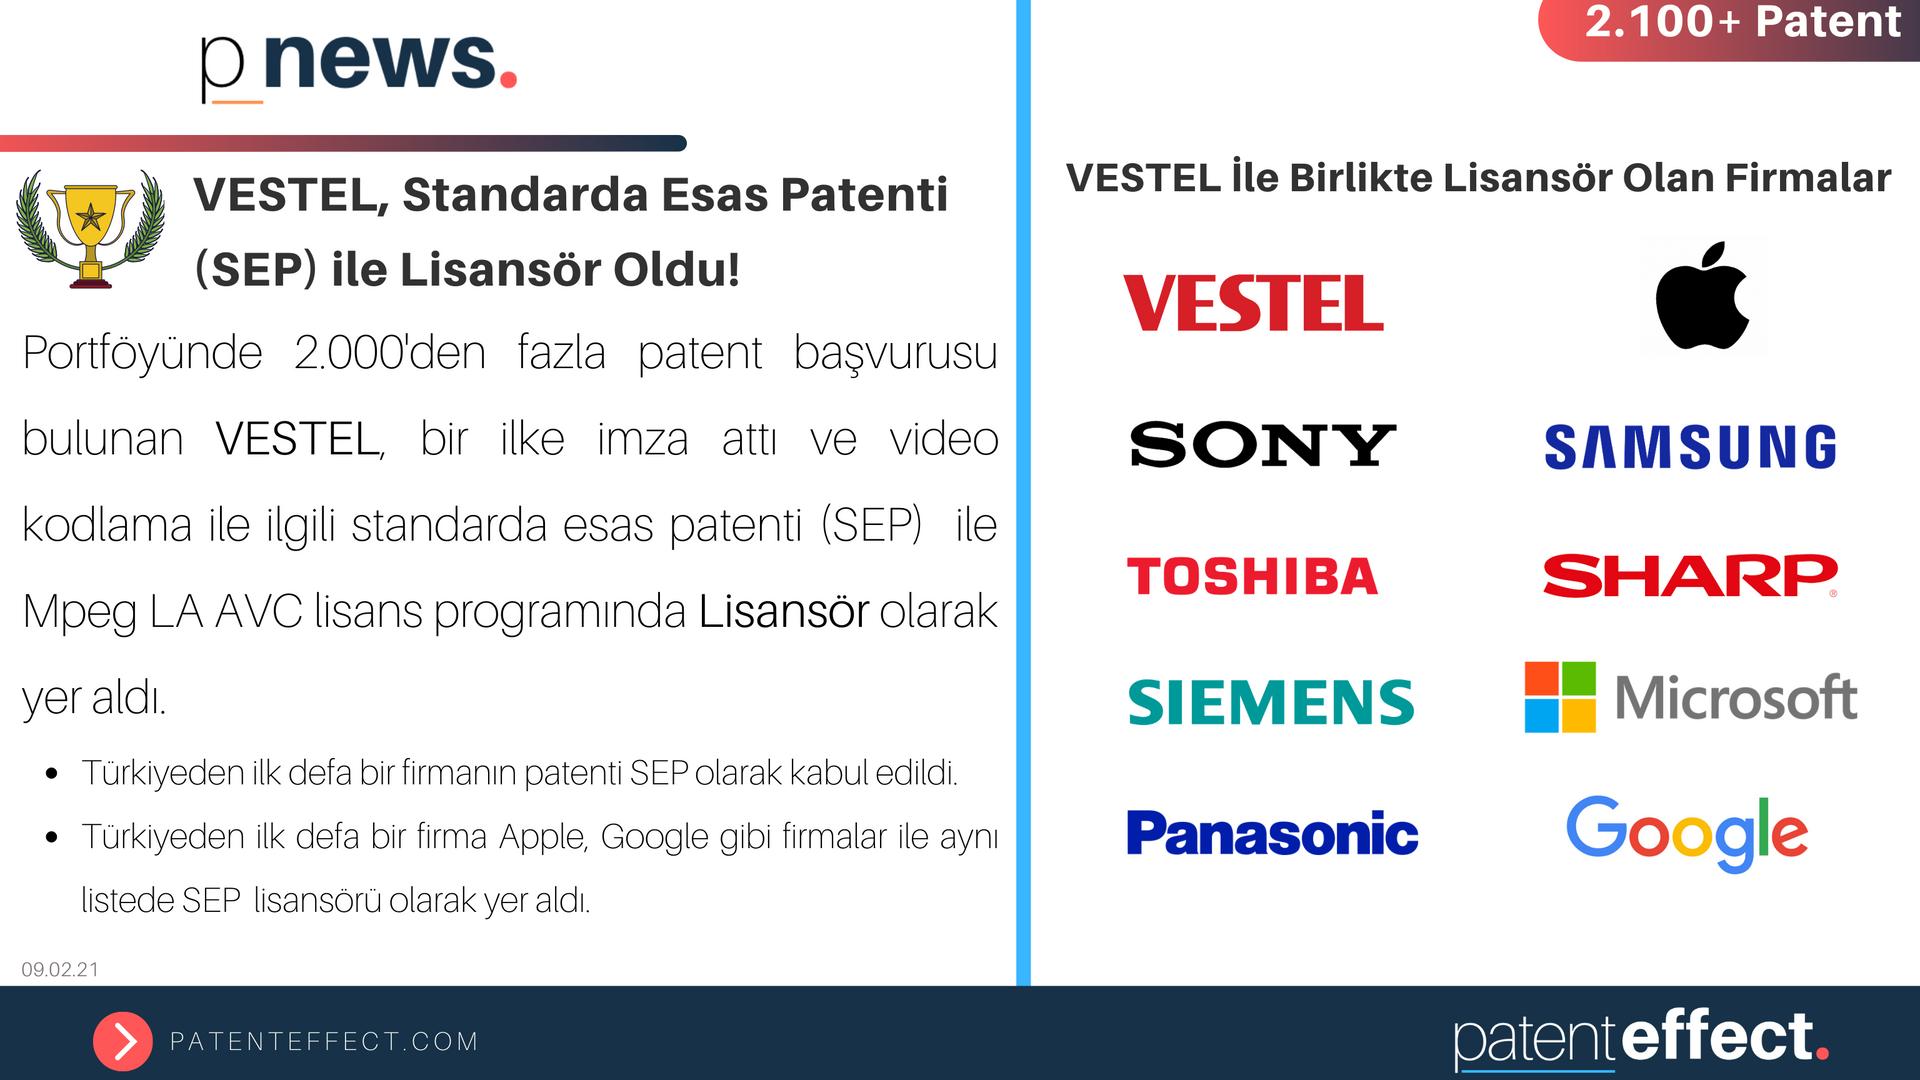 VESTEL, Standarda Esas Patenti (SEP) ile Lisansör Oldu!